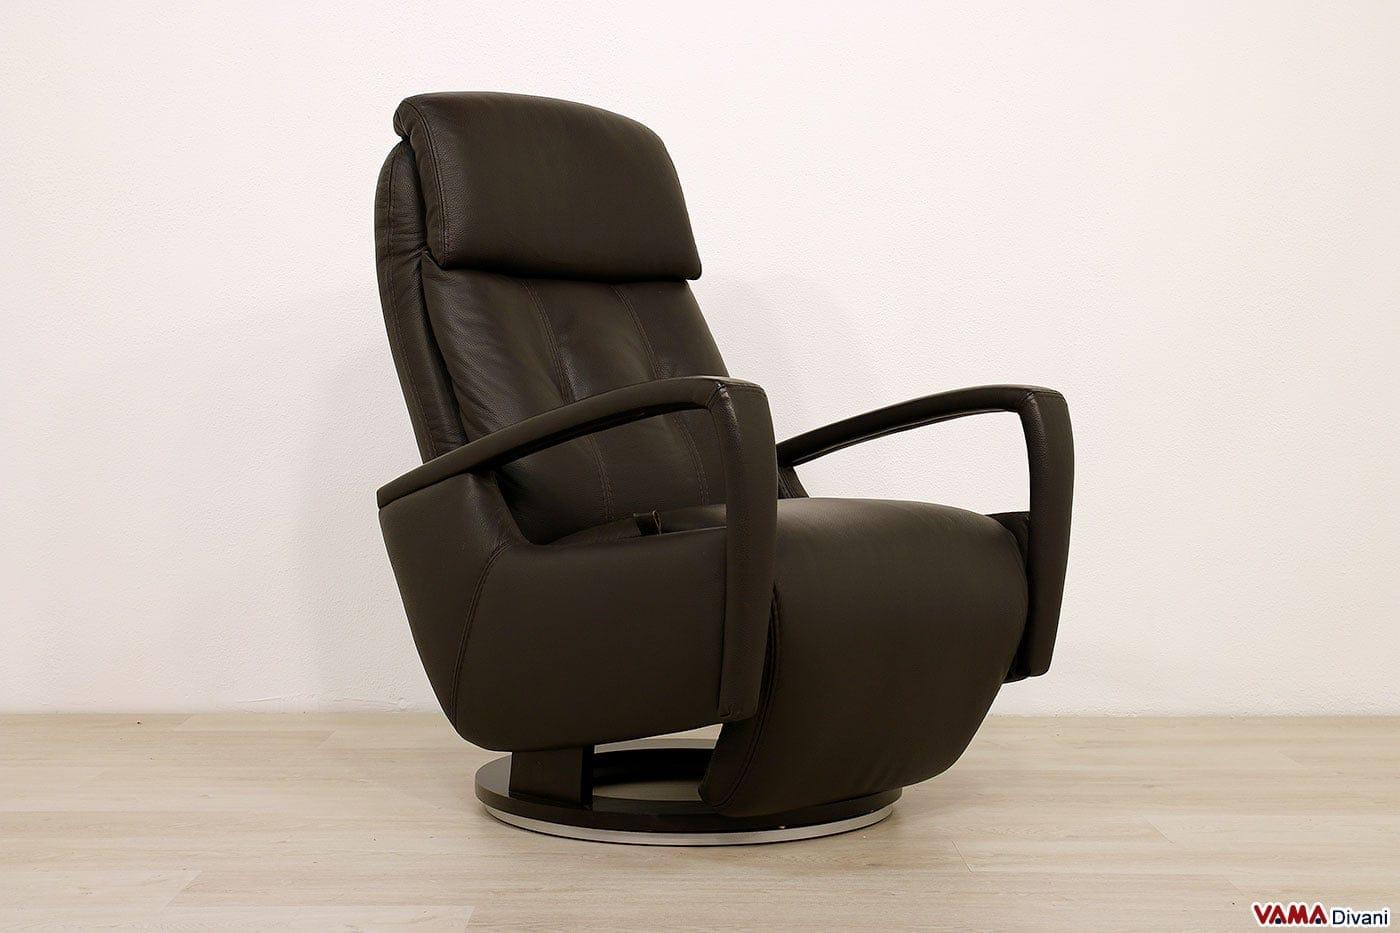 Poltrona relax manuale moderna reclinabile con girevole - Poltrona relax design ...